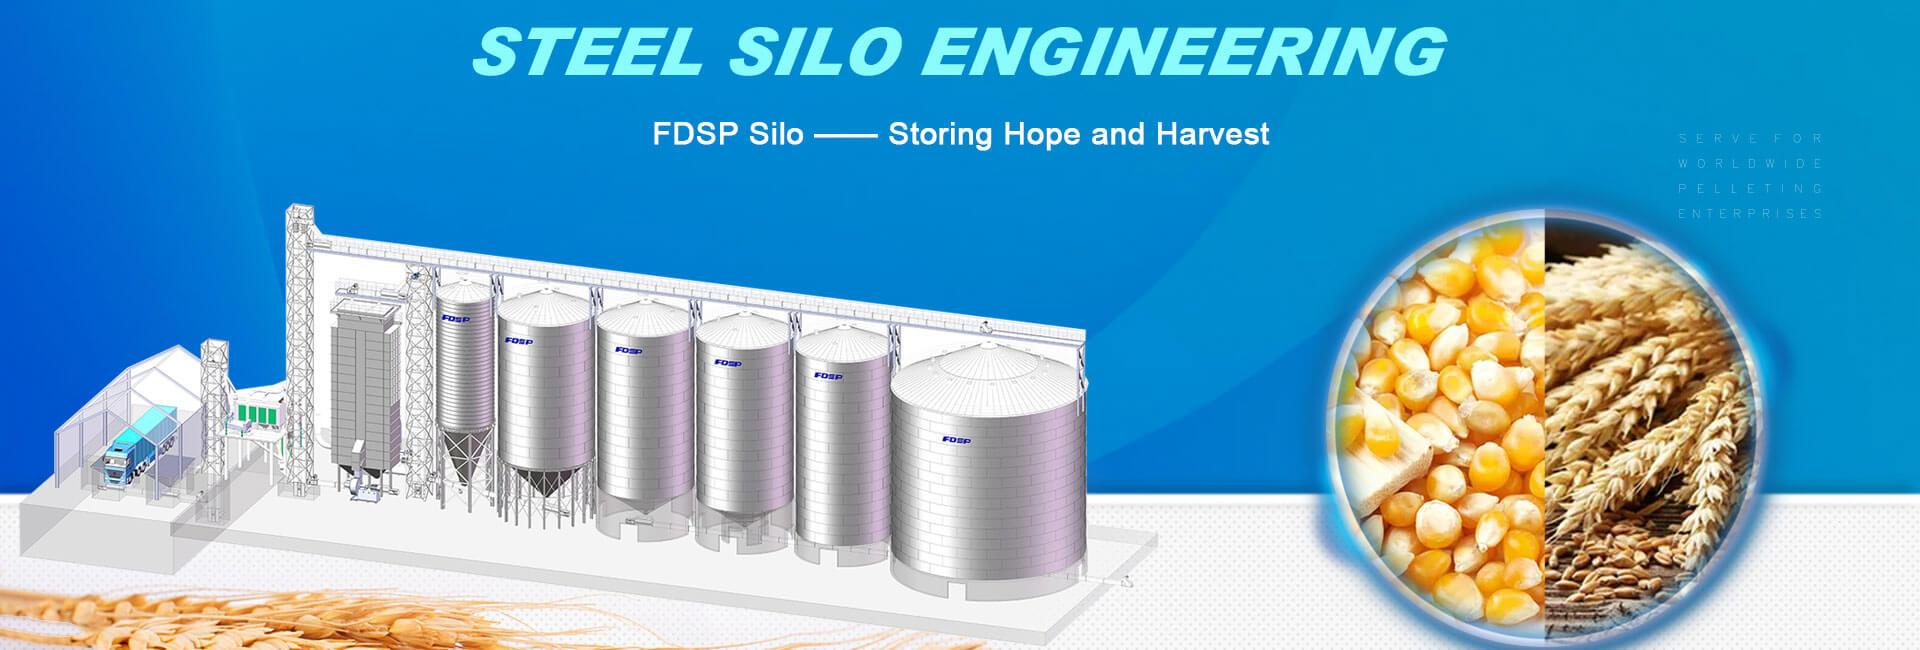 steel silo engineering